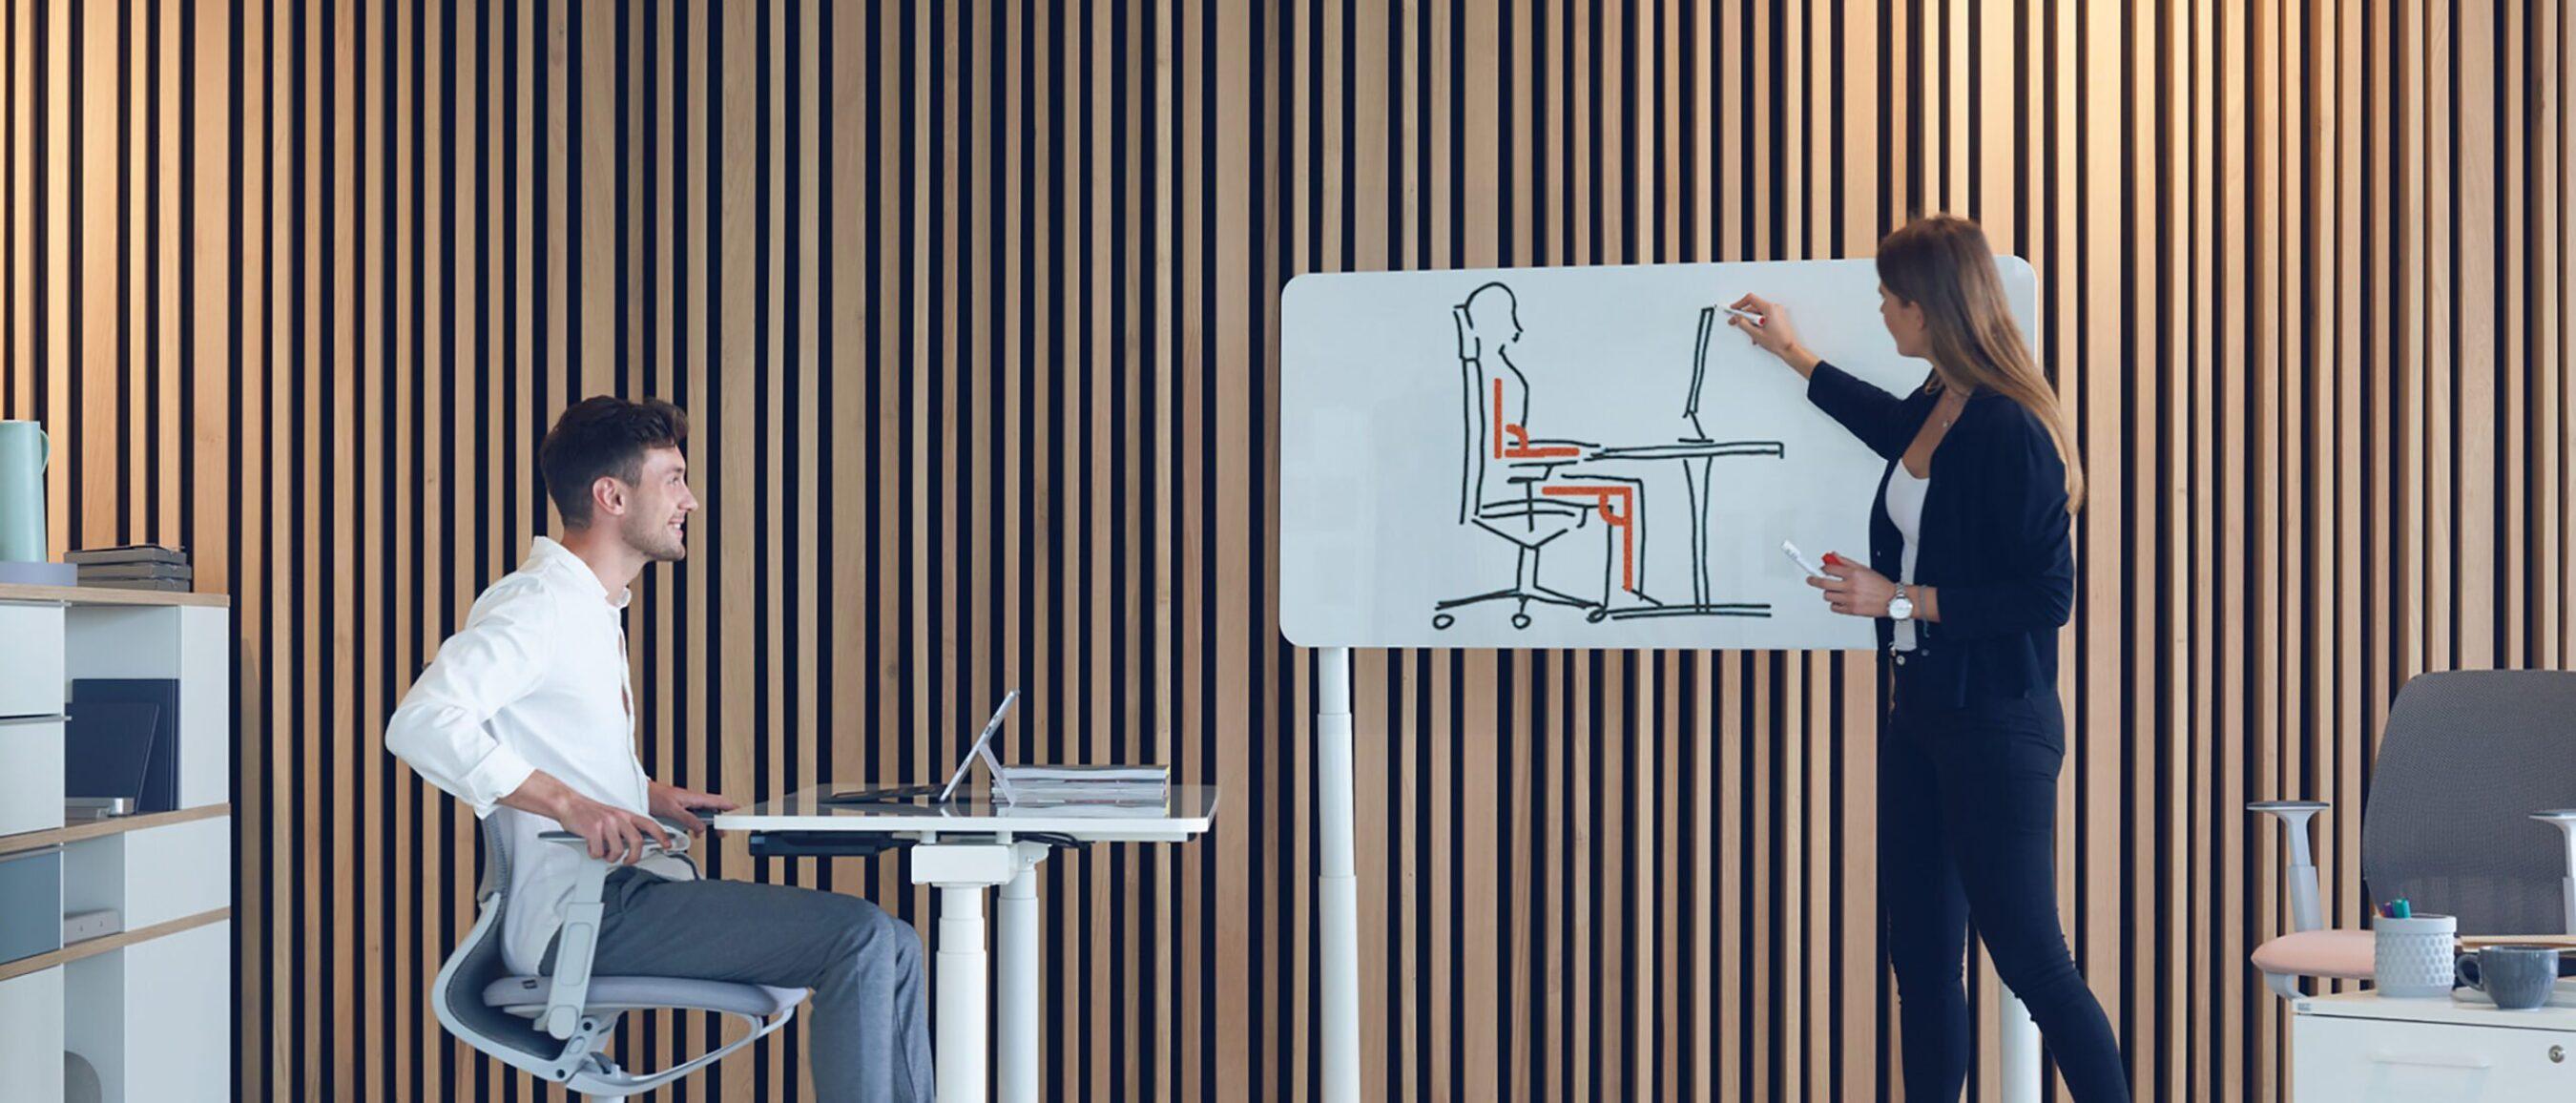 feco Büromöbel-Wissensdatenbank │Ergonomie am Arbeitsplatz